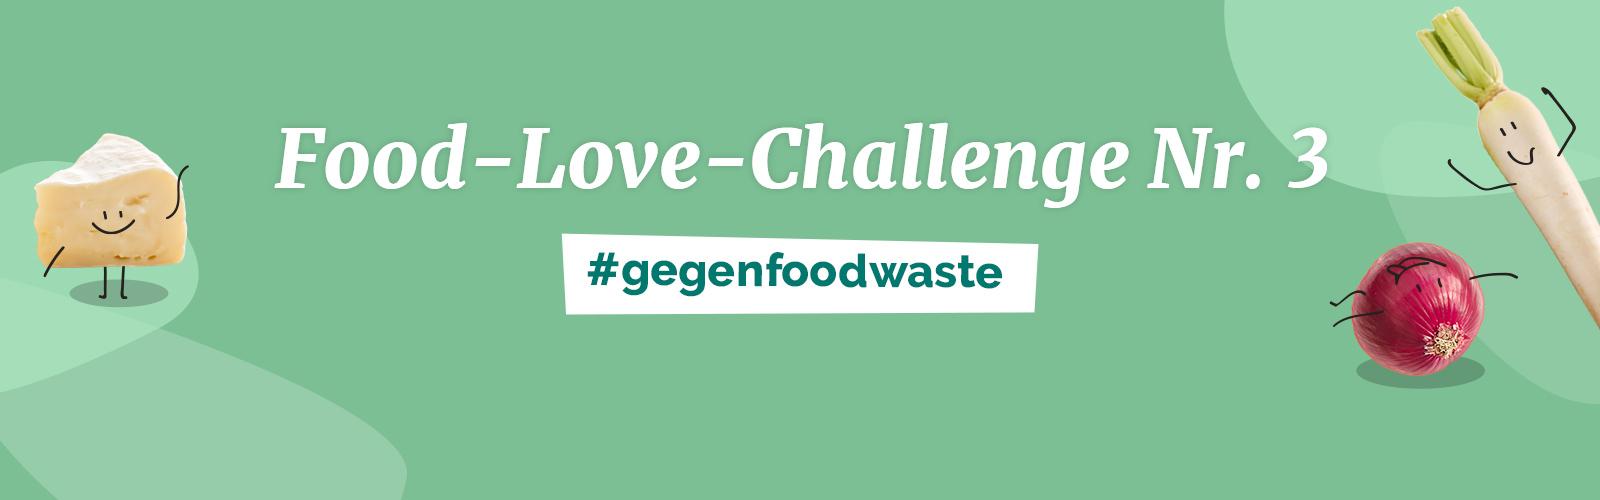 Food Love Challenge Nr. 3